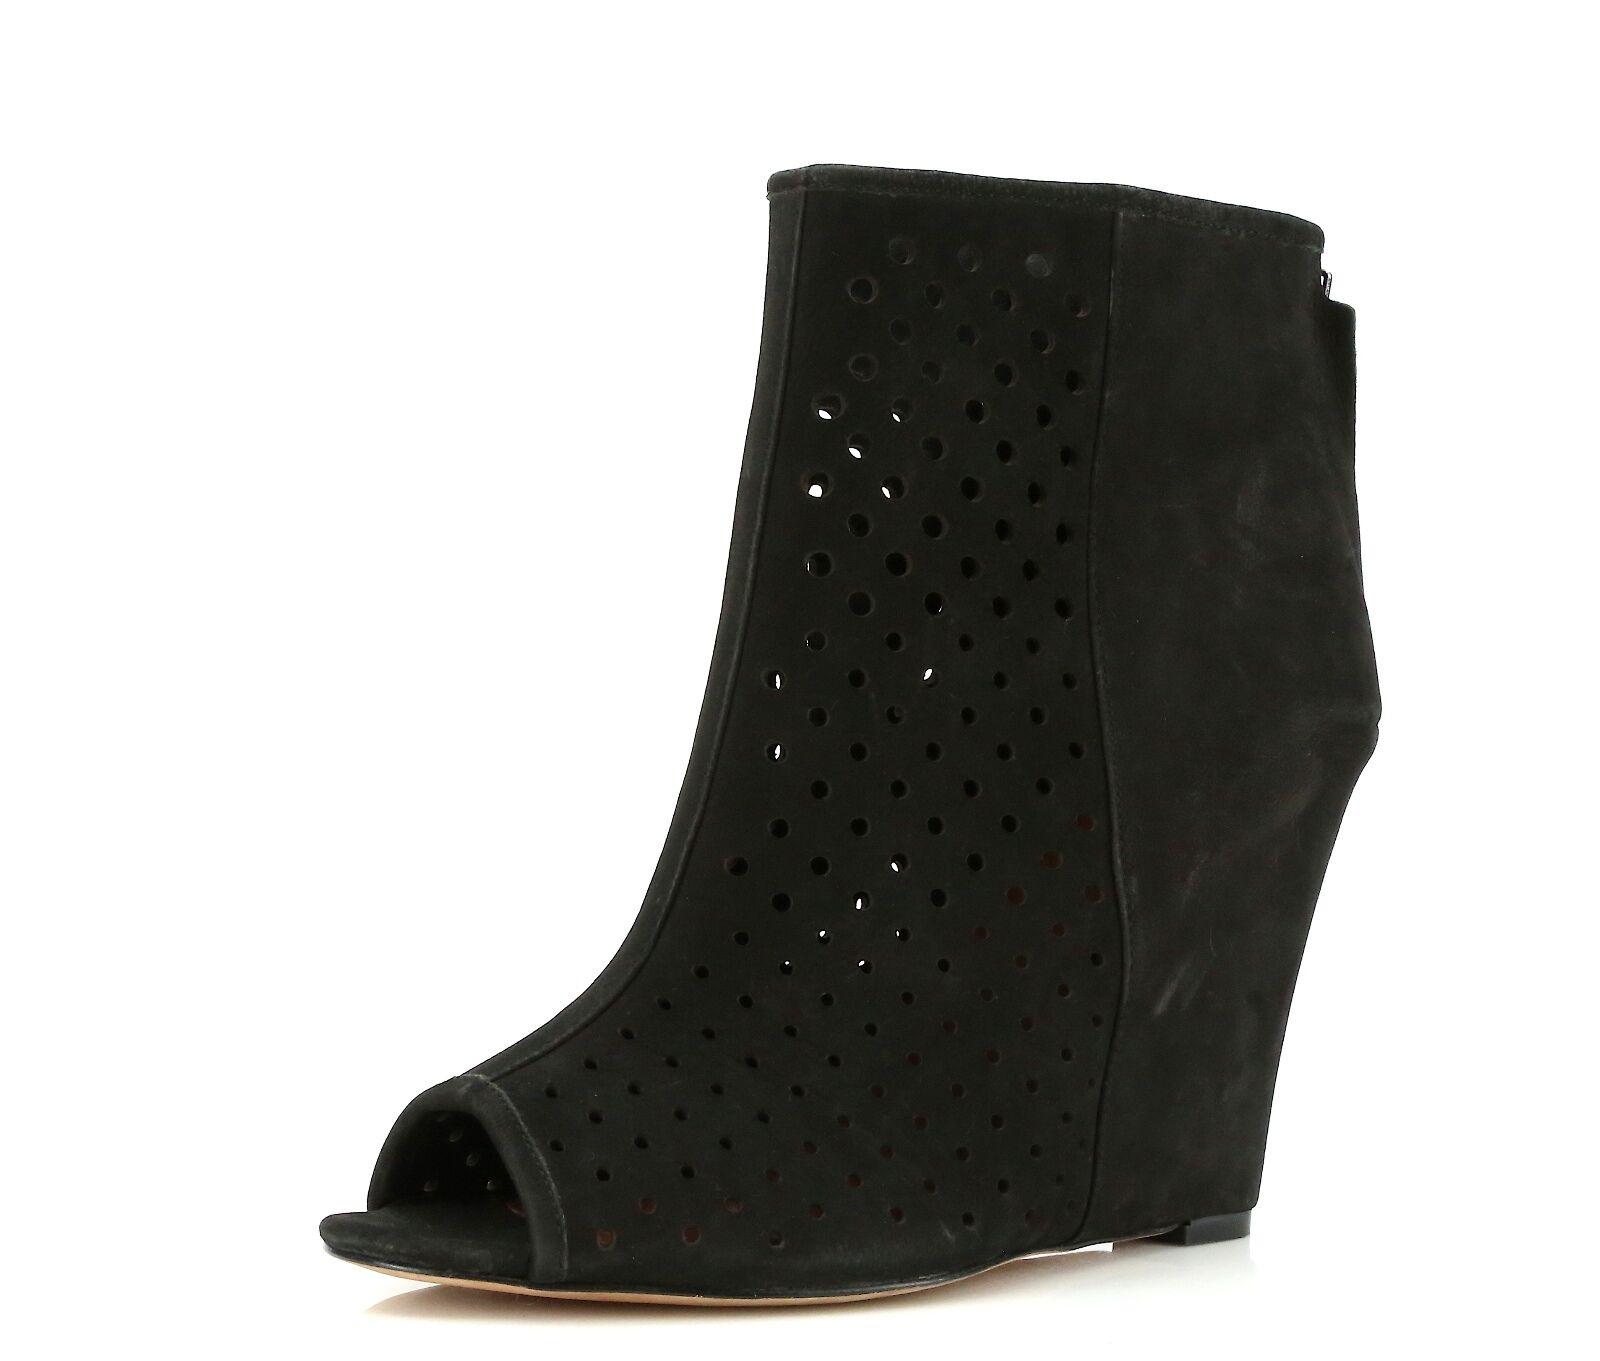 a prezzi accessibili Rebecca Minkoff nero Leather Wedge Peep Toe Heels Heels Heels 2030 Dimensione 9 M  spedizione gratuita!